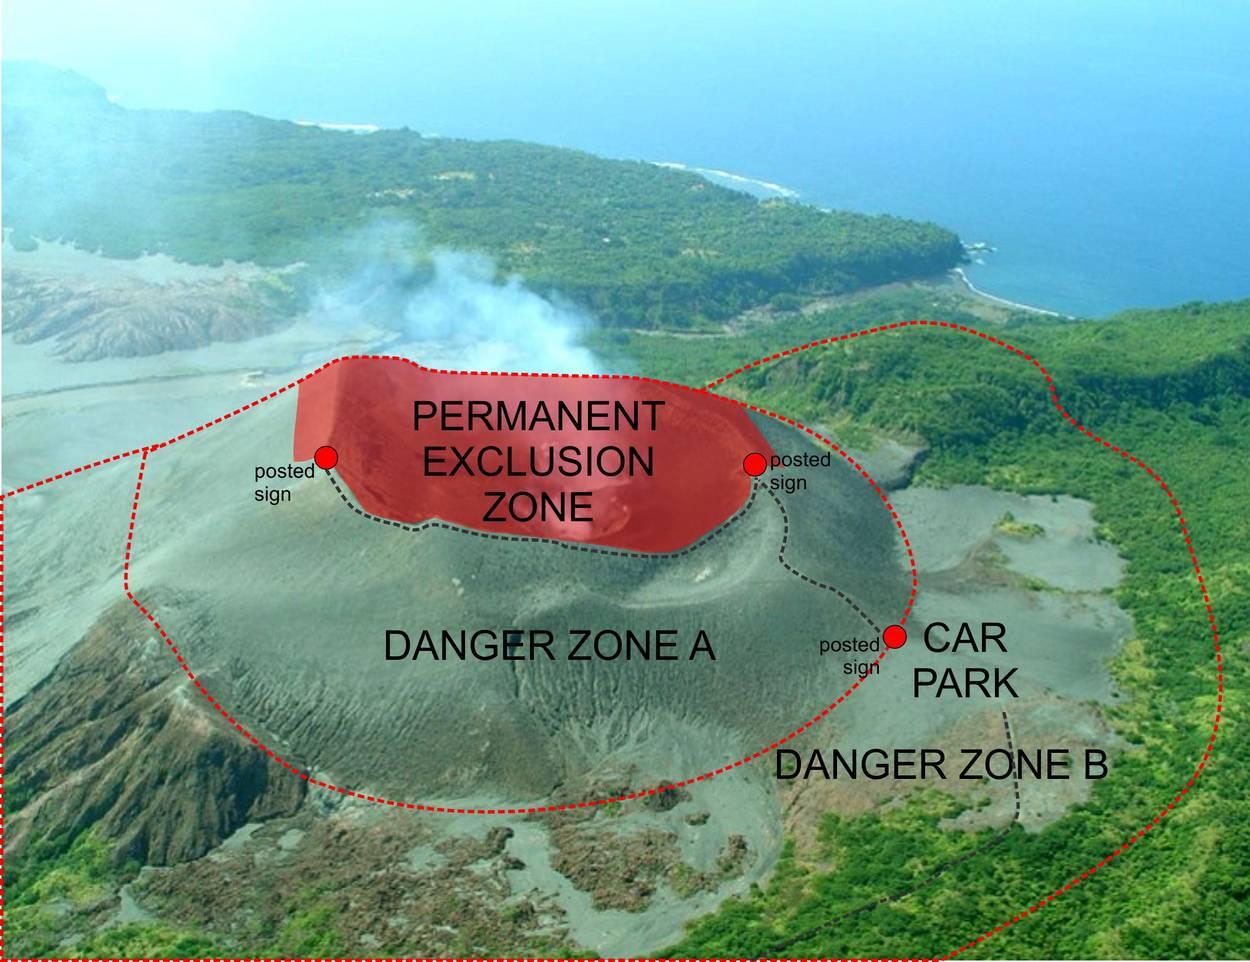 Yasur caldera safety map (C) Vanuatu Meteorology and Geohazards Department